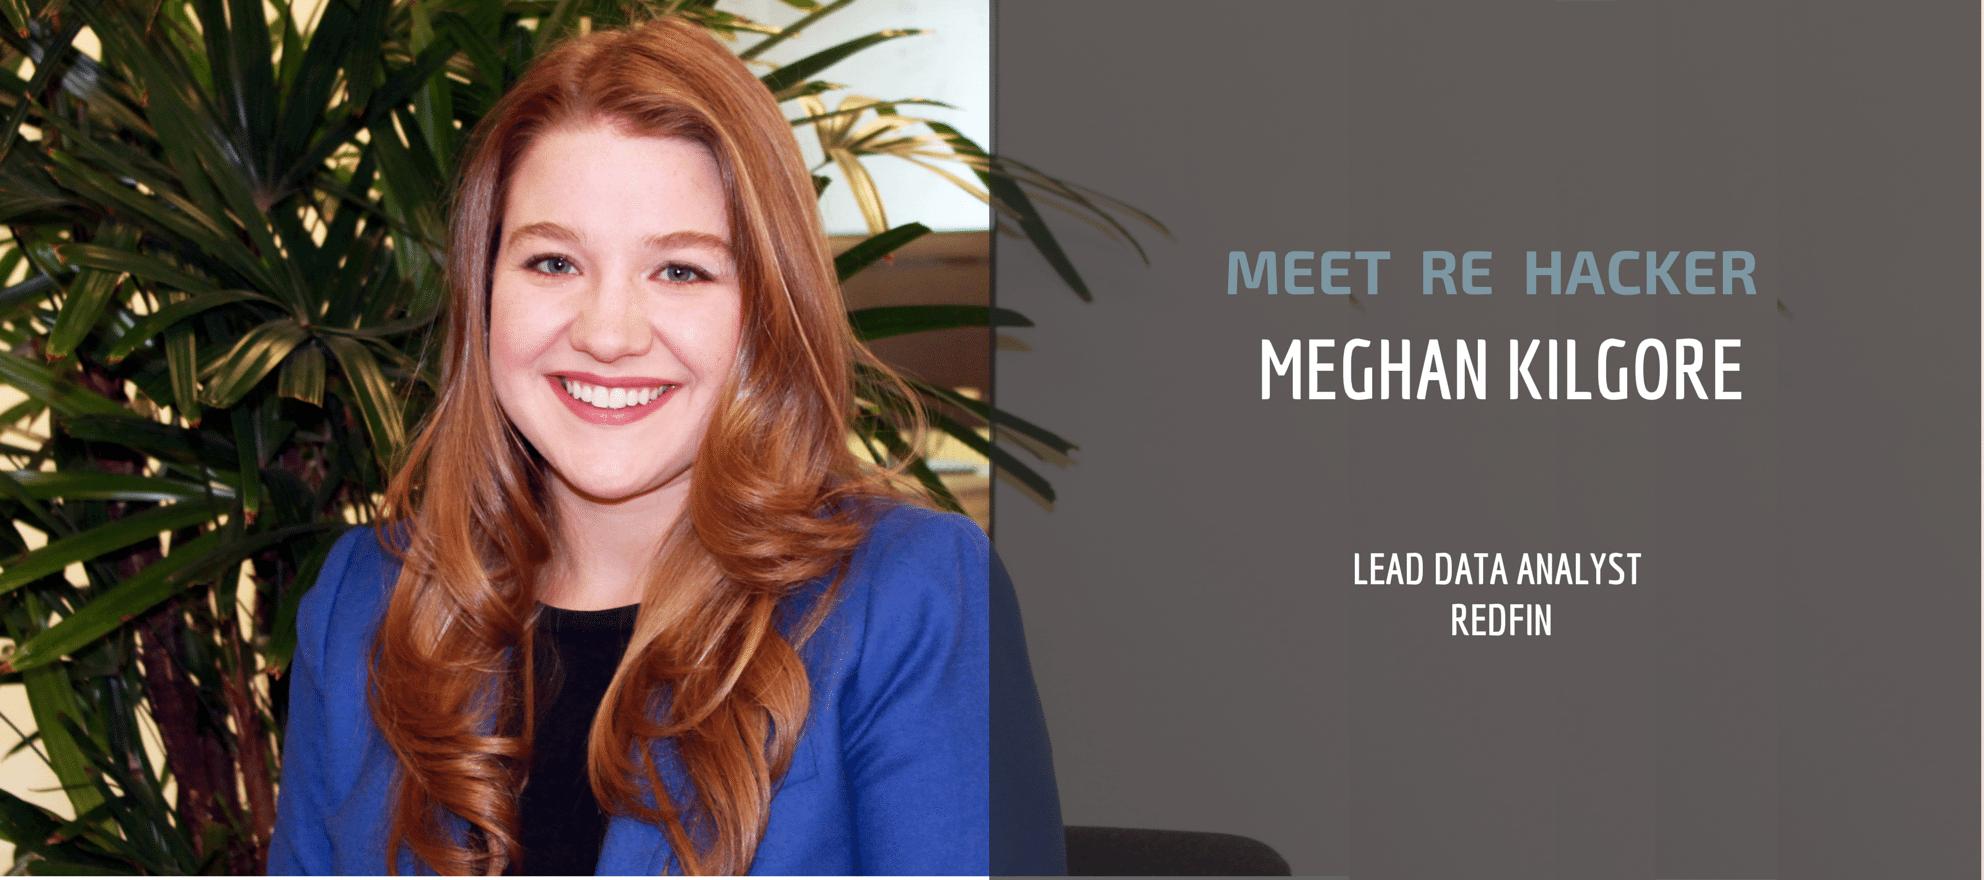 Hacker profile: Meghan Kilgore